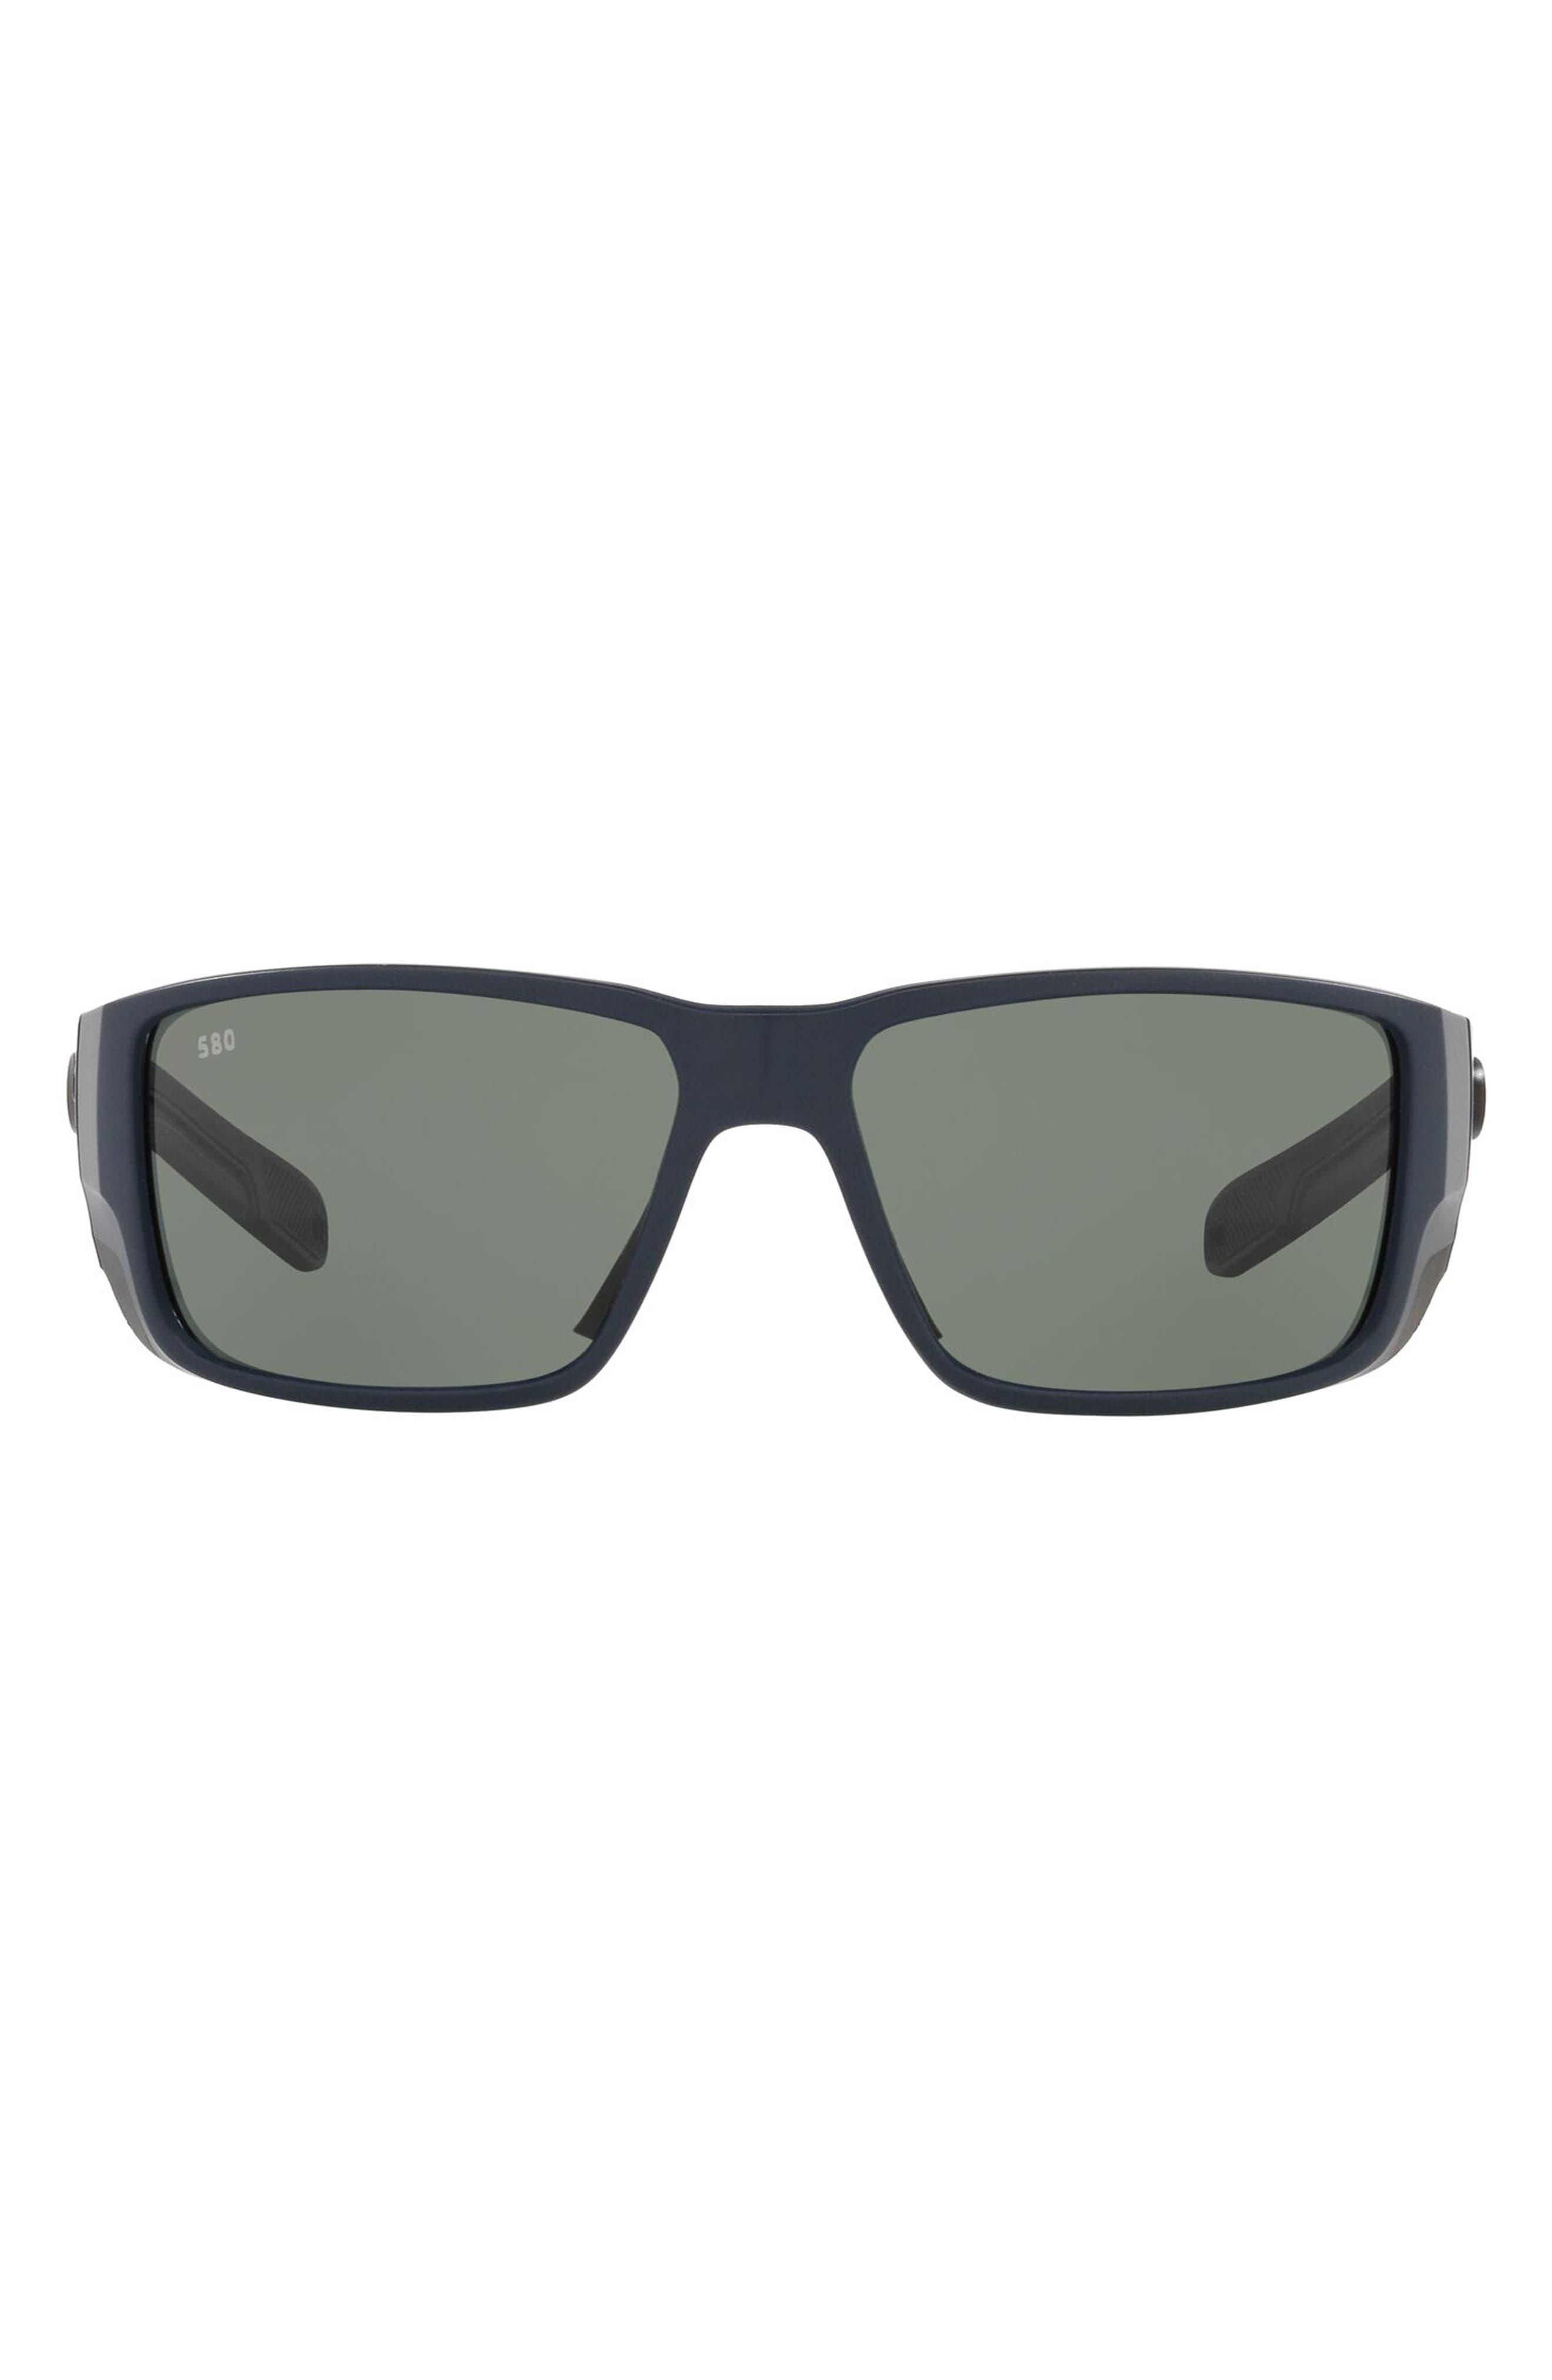 60mm Wraparound Sunglasses